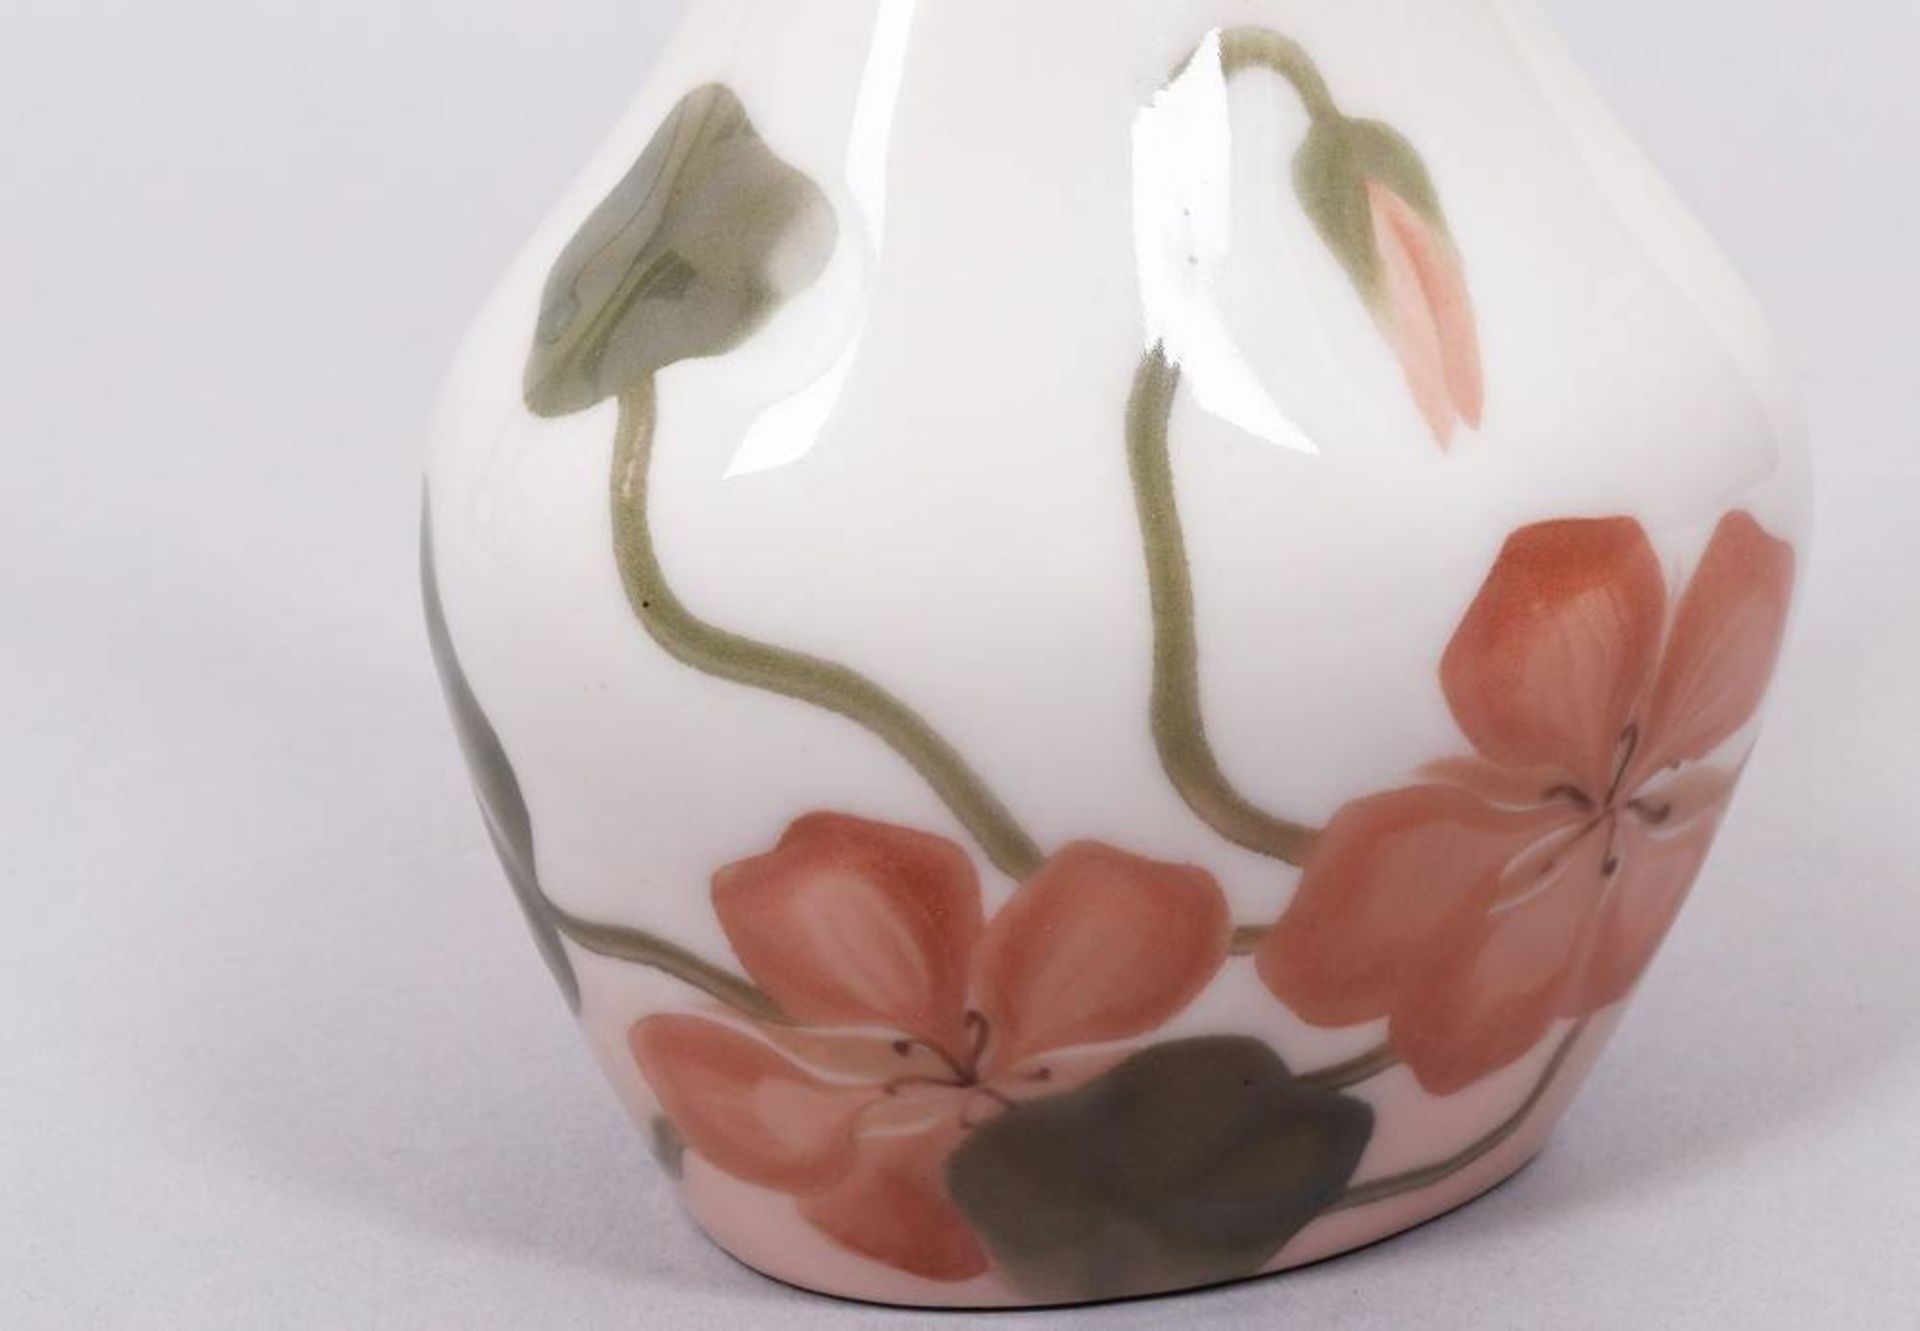 Small narrow neck vase, Bing & Grondahl, 1915-47 - Image 2 of 4